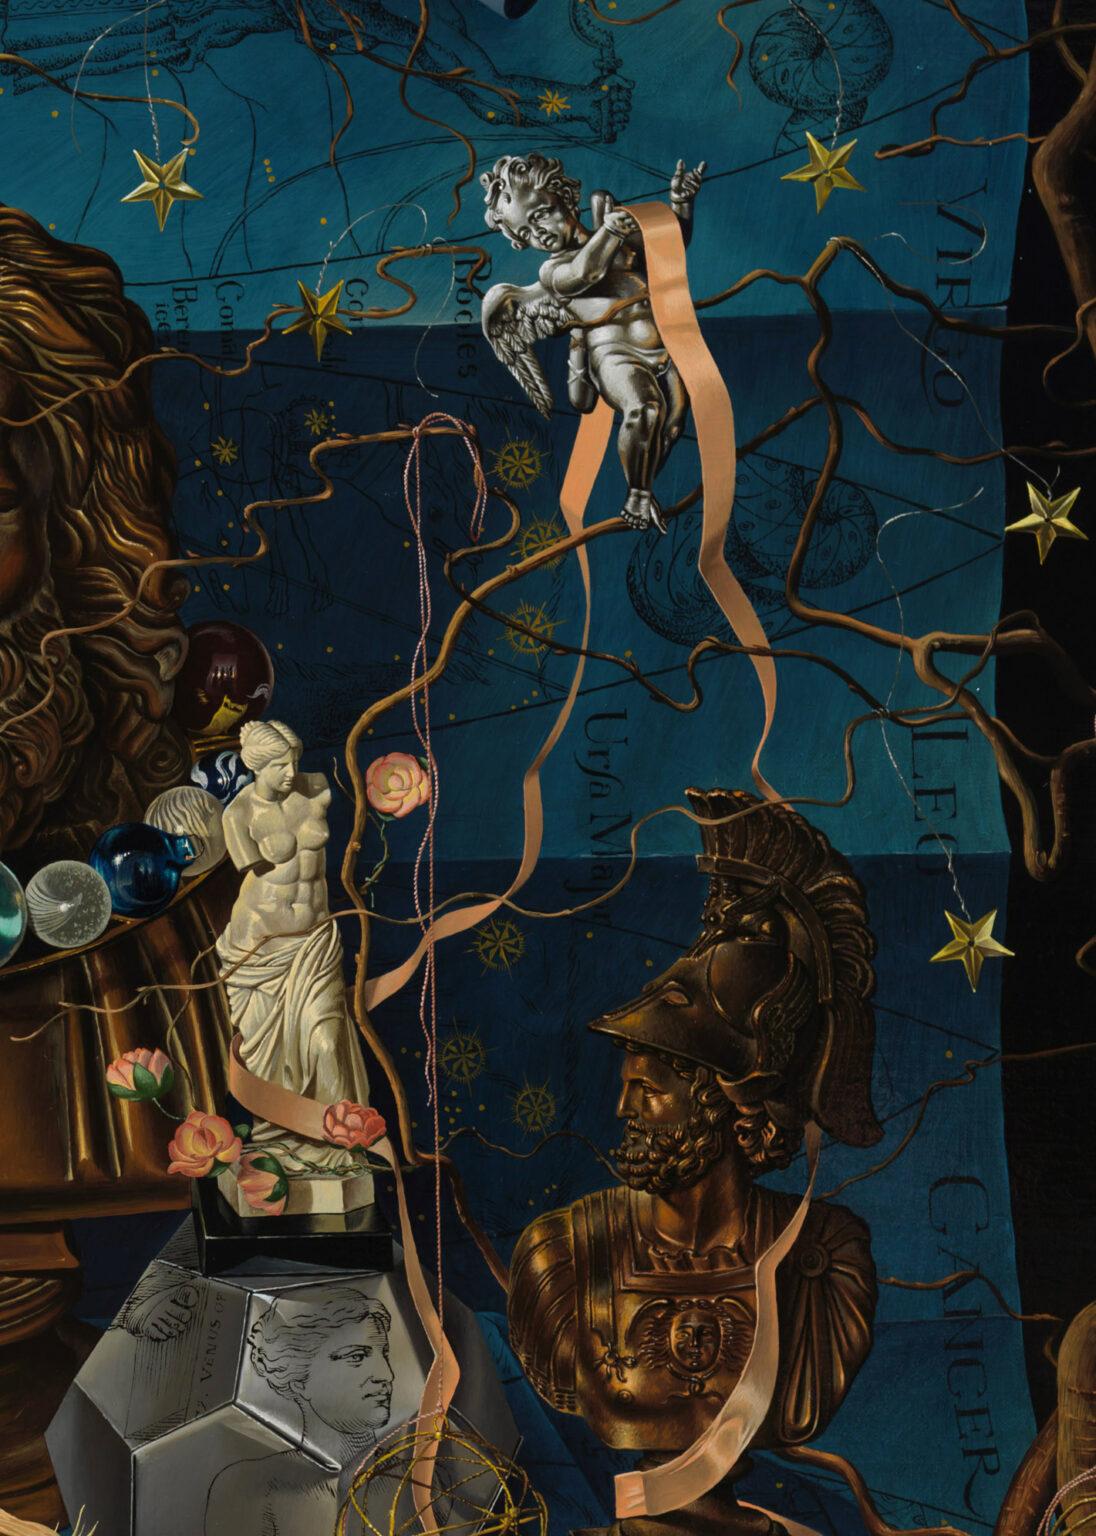 THE-HEAVENS-giclee-print-detail 10-Miriam-Escofet